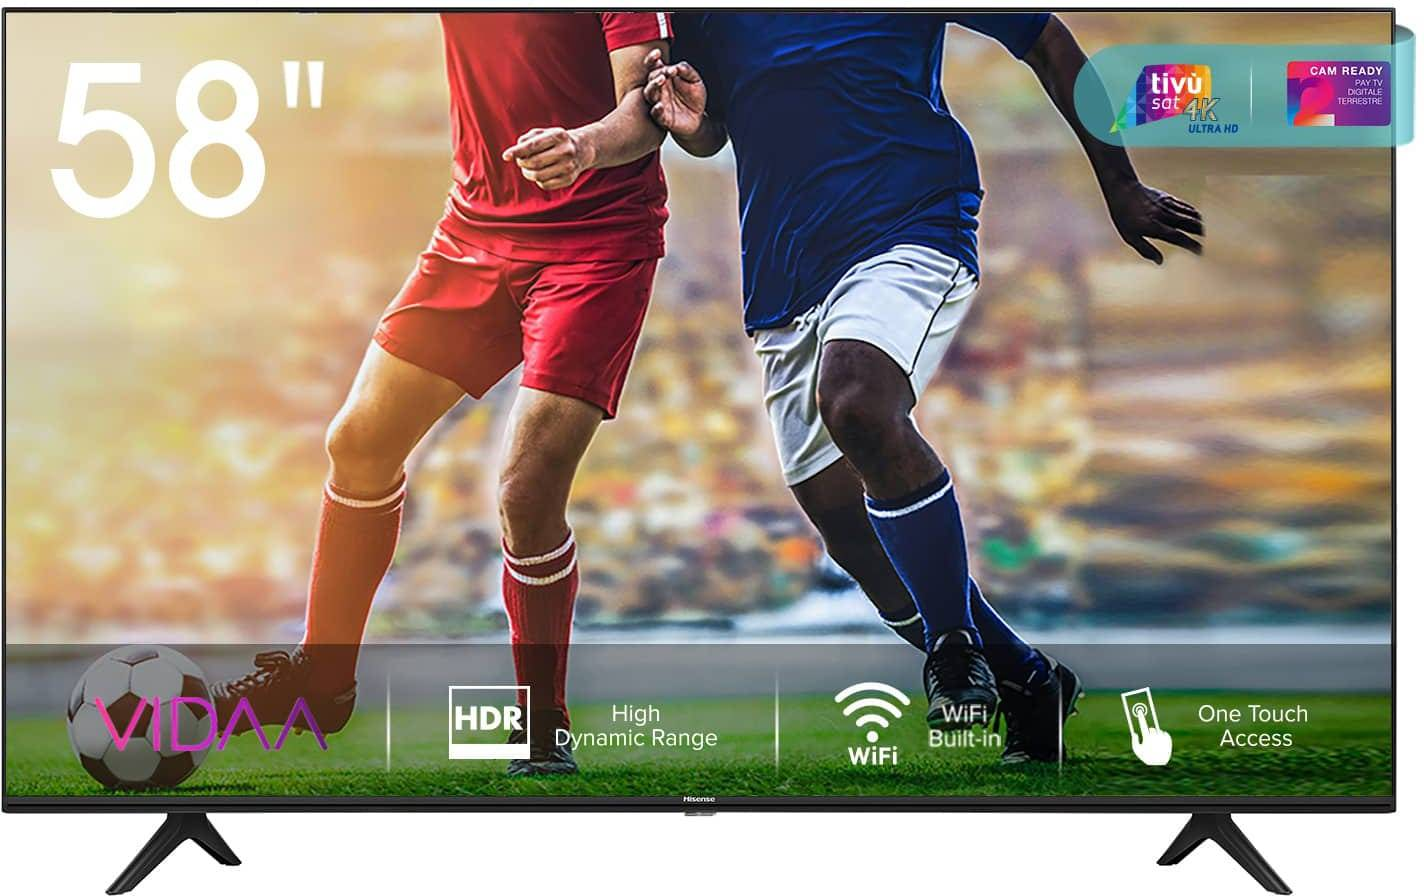 Hisense 58a7100f 58a7100f Smart Tv 58 Pollici 4k Ultra Hd Televisore Led Dvb-T2 Wifi Lan Modalità Hotel Garanzia Italia